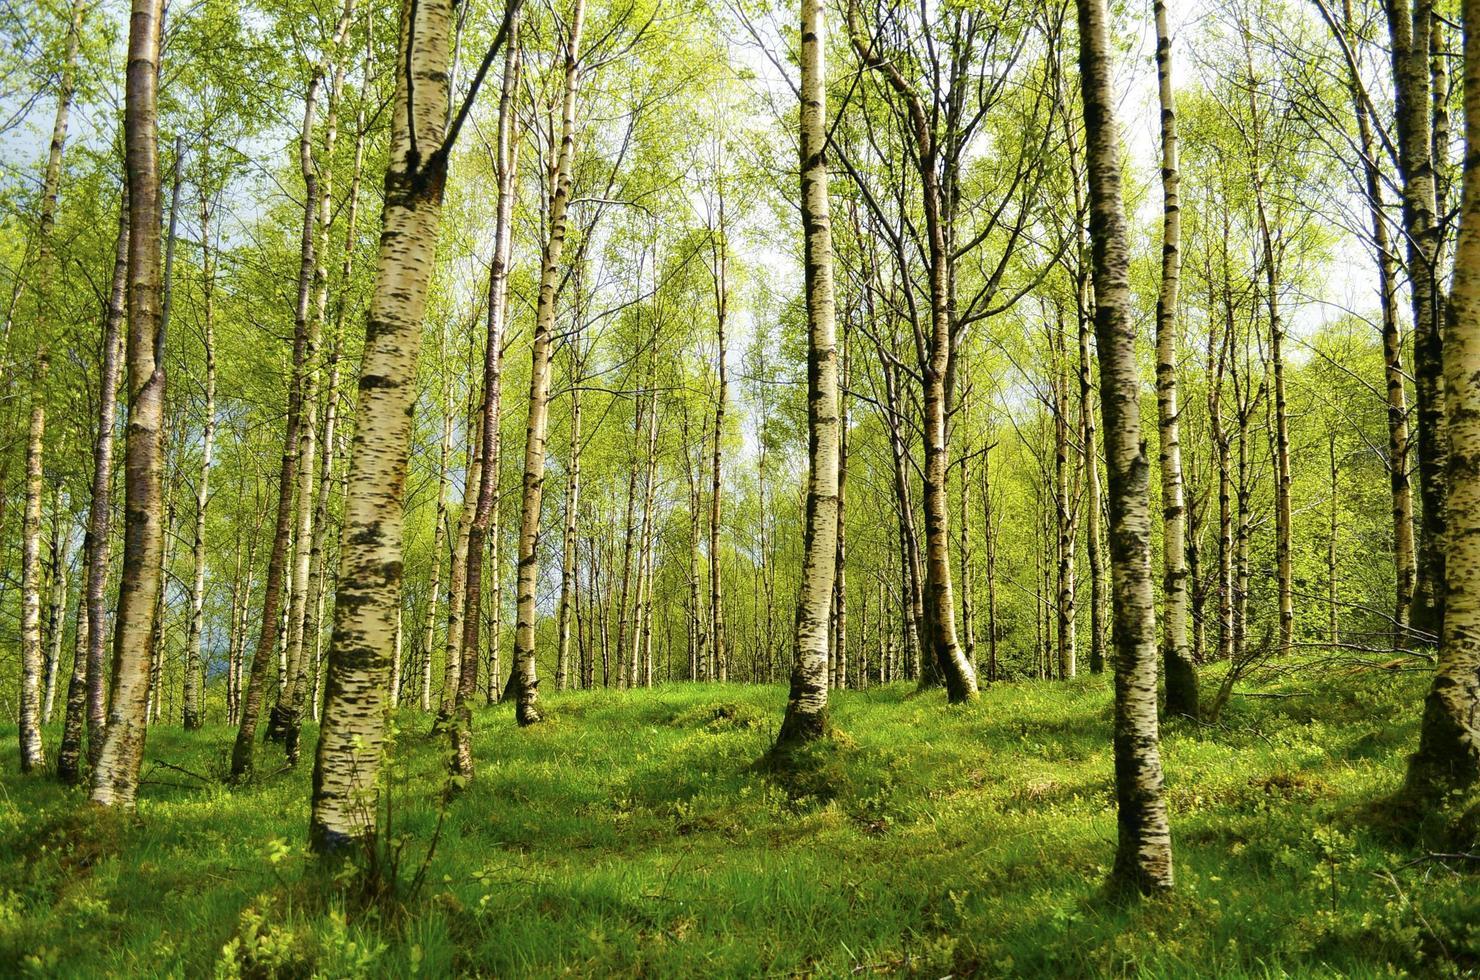 Beautiful birch forest photo